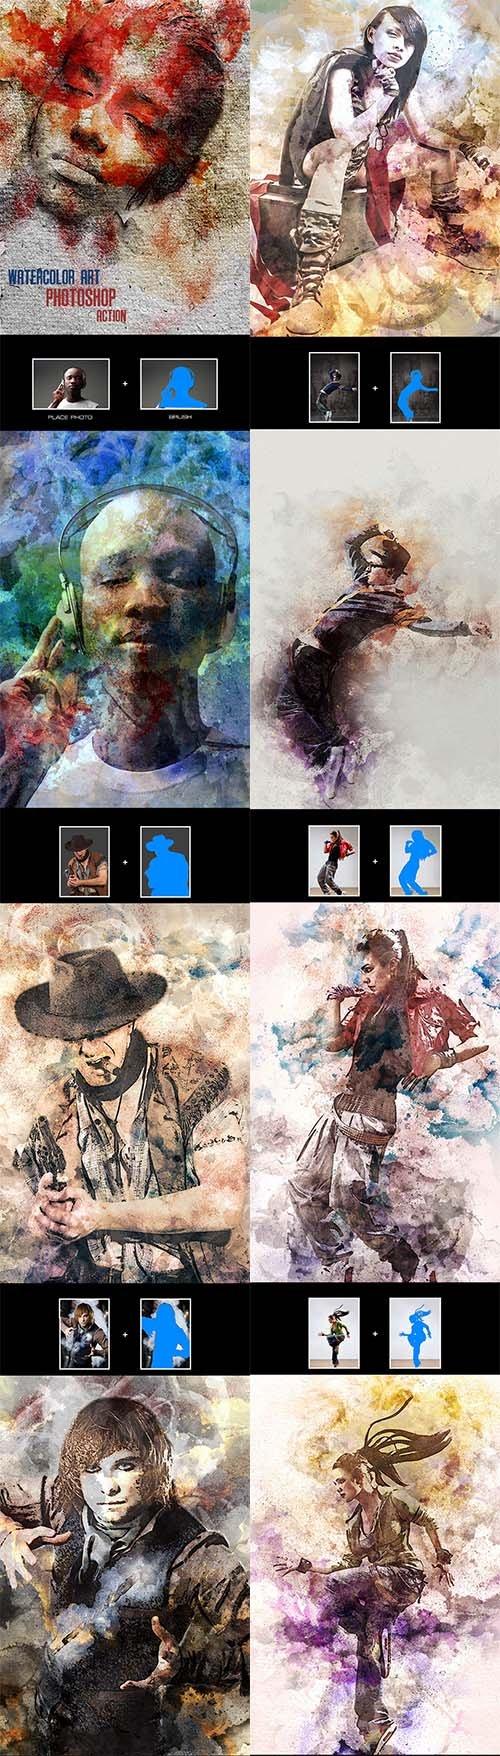 GraphicRiver - Watercolor Art - Photoshop Action 12259424